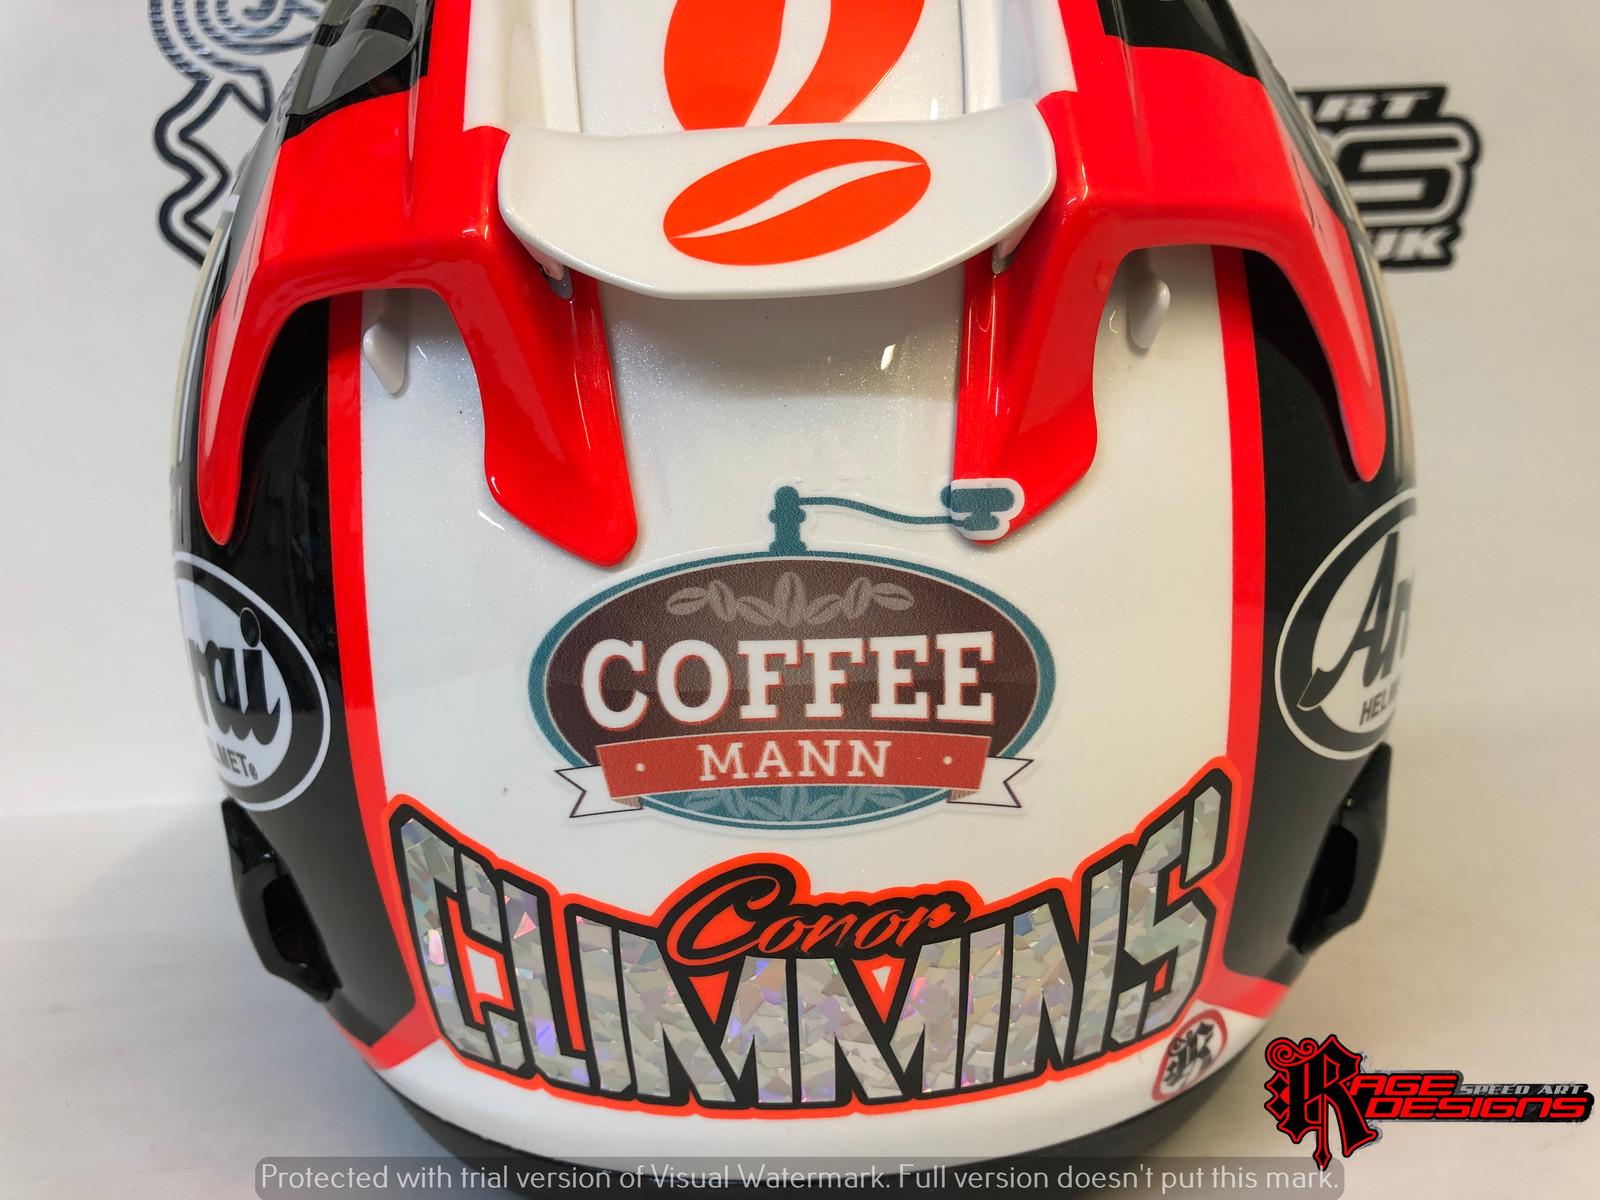 Conor Cummins - 2019 Arai Helmet Design by Rage Designs